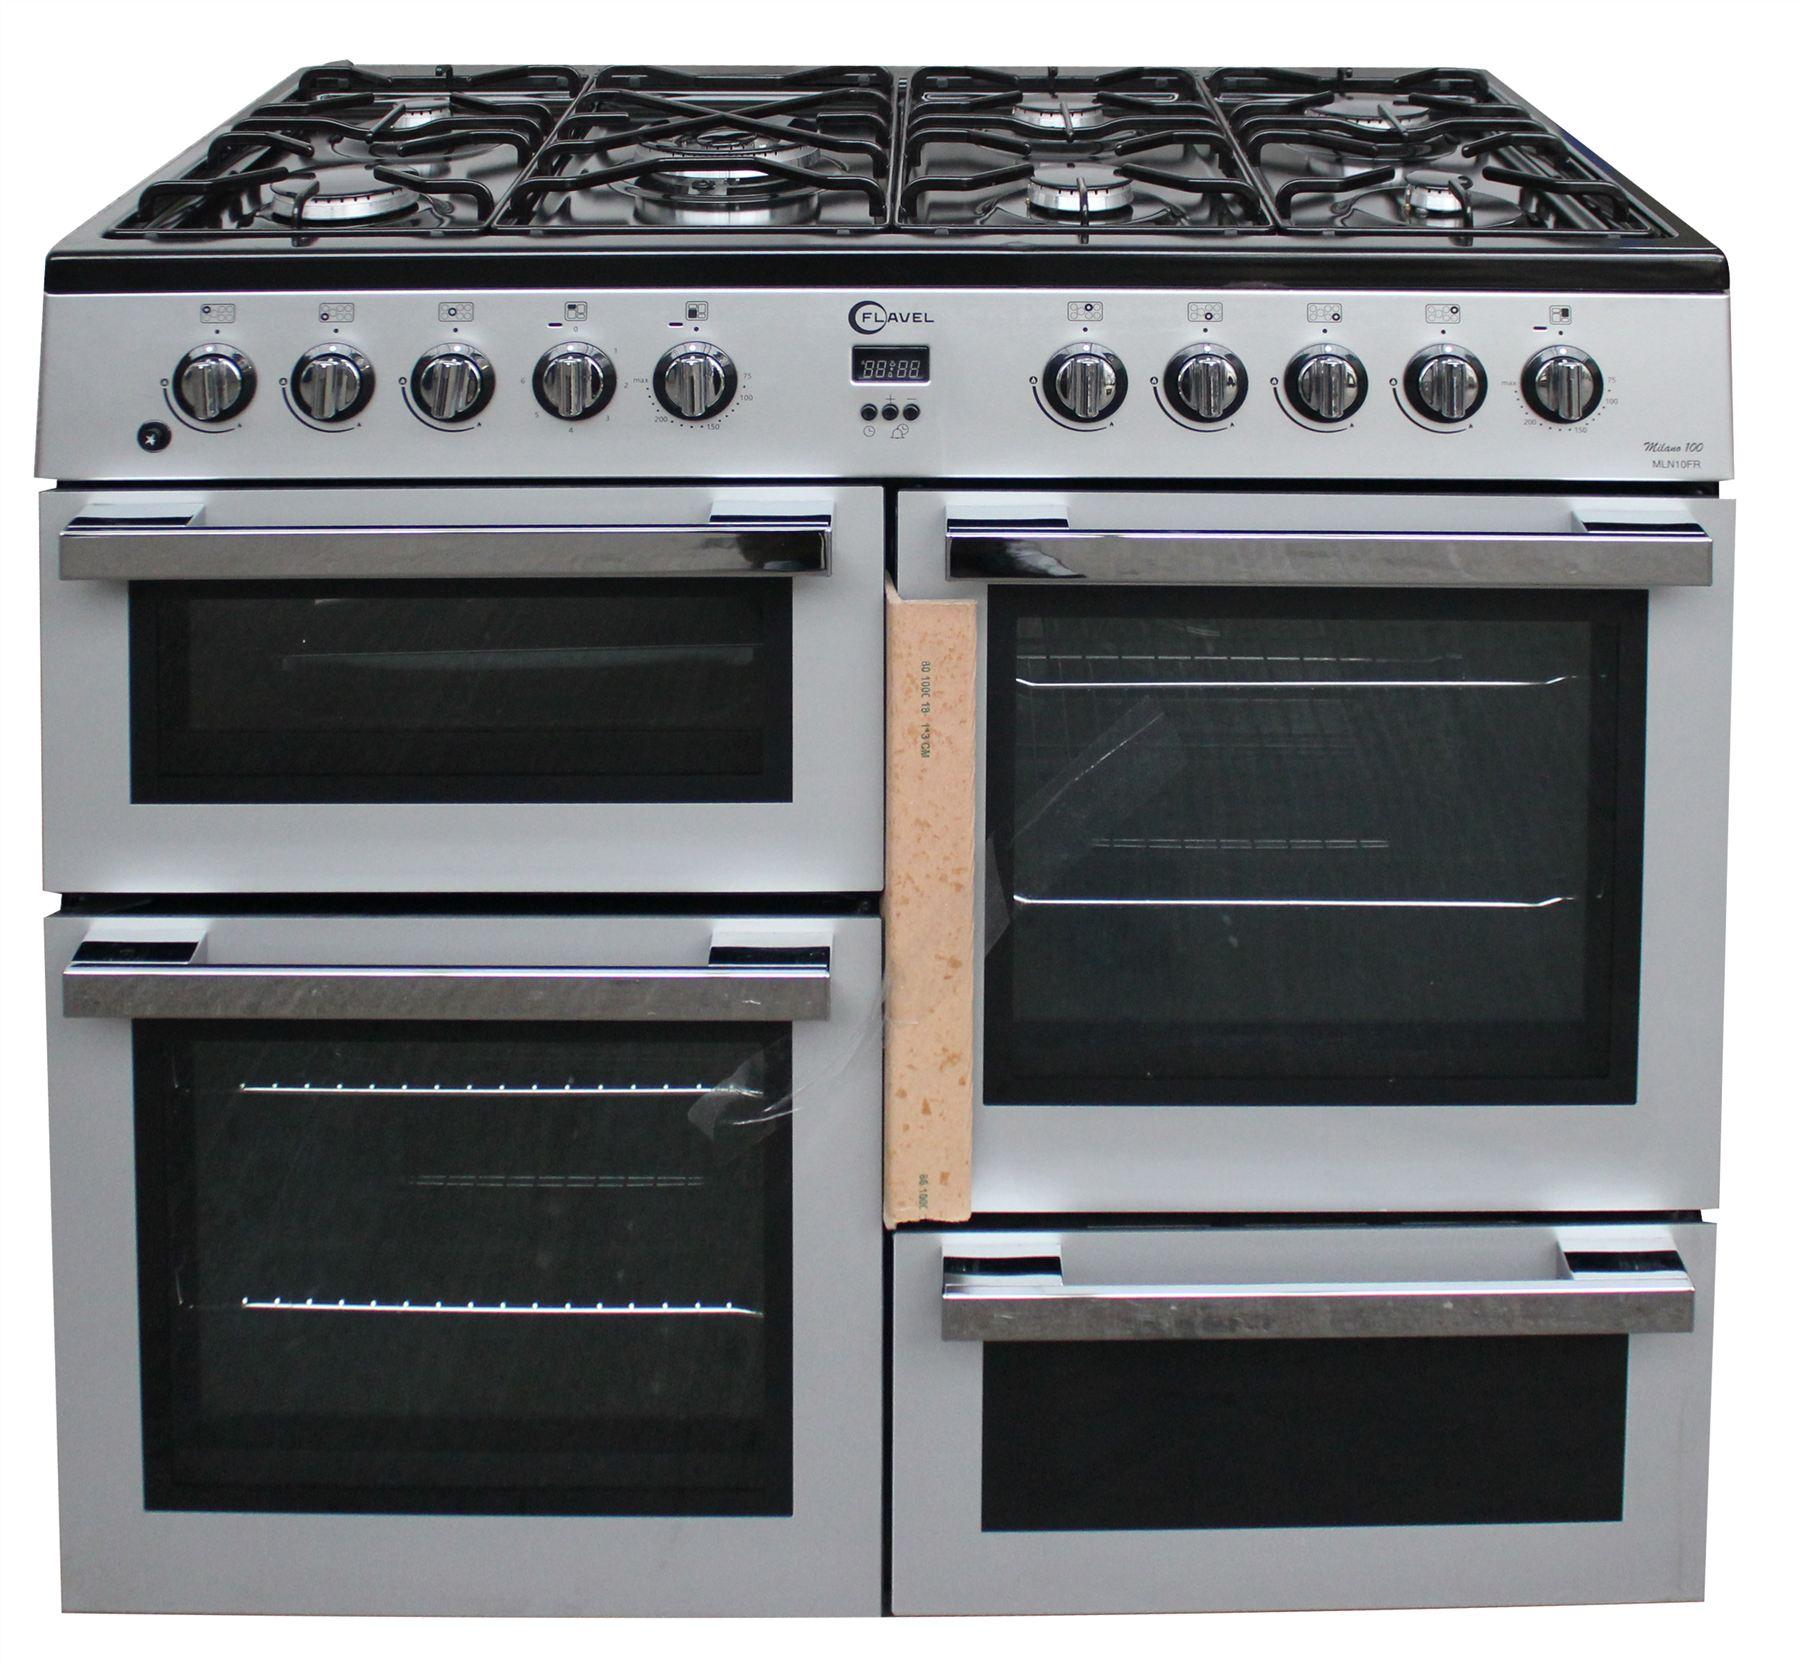 Double Double 100cm : Flavel mln frs cm range cooker double oven burner